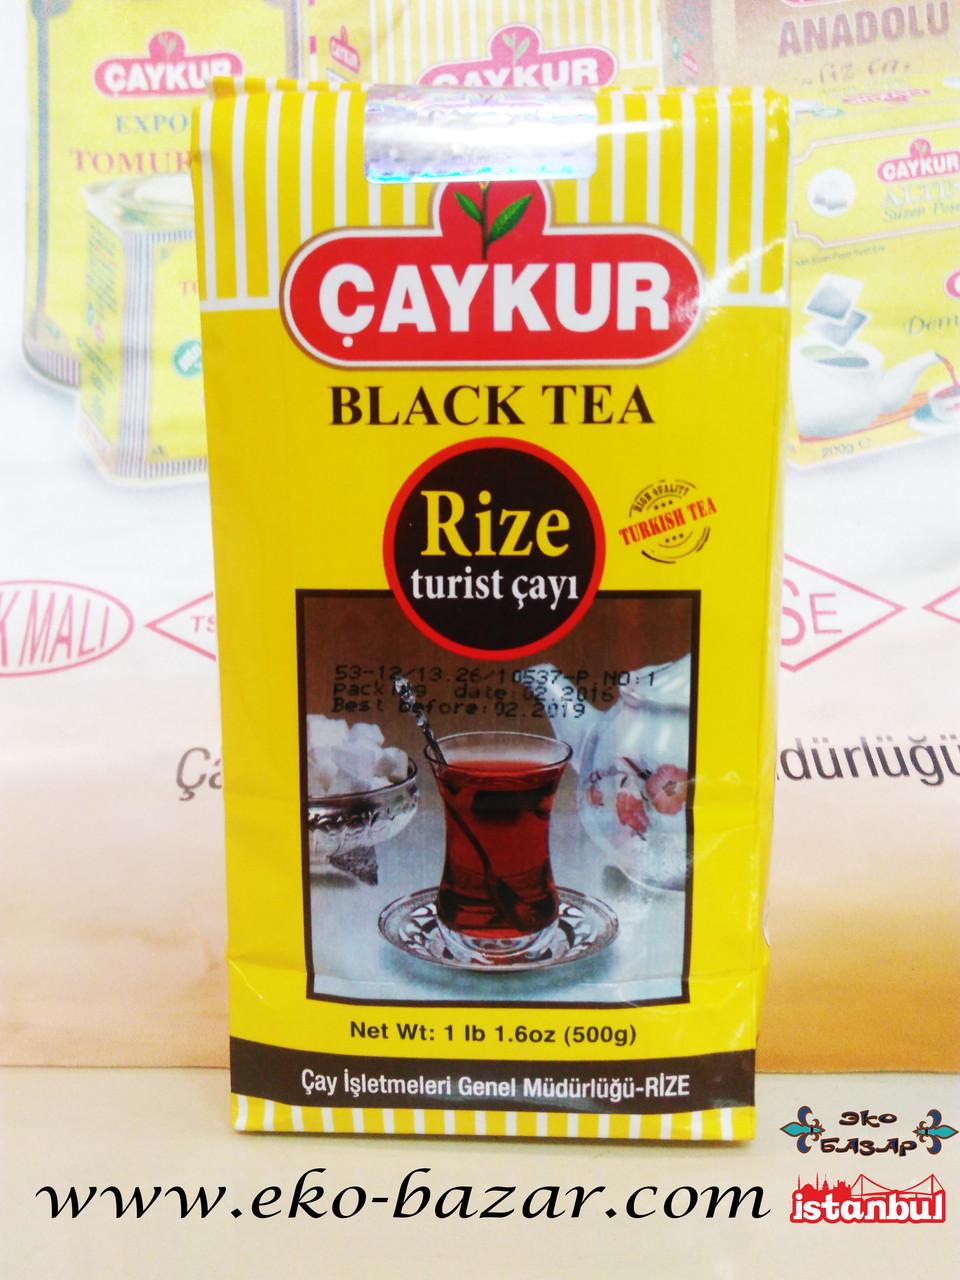 Чай черный турецкий  Ризе Турист (Çaykur rize turist), 0,5 кг TM Çaykur